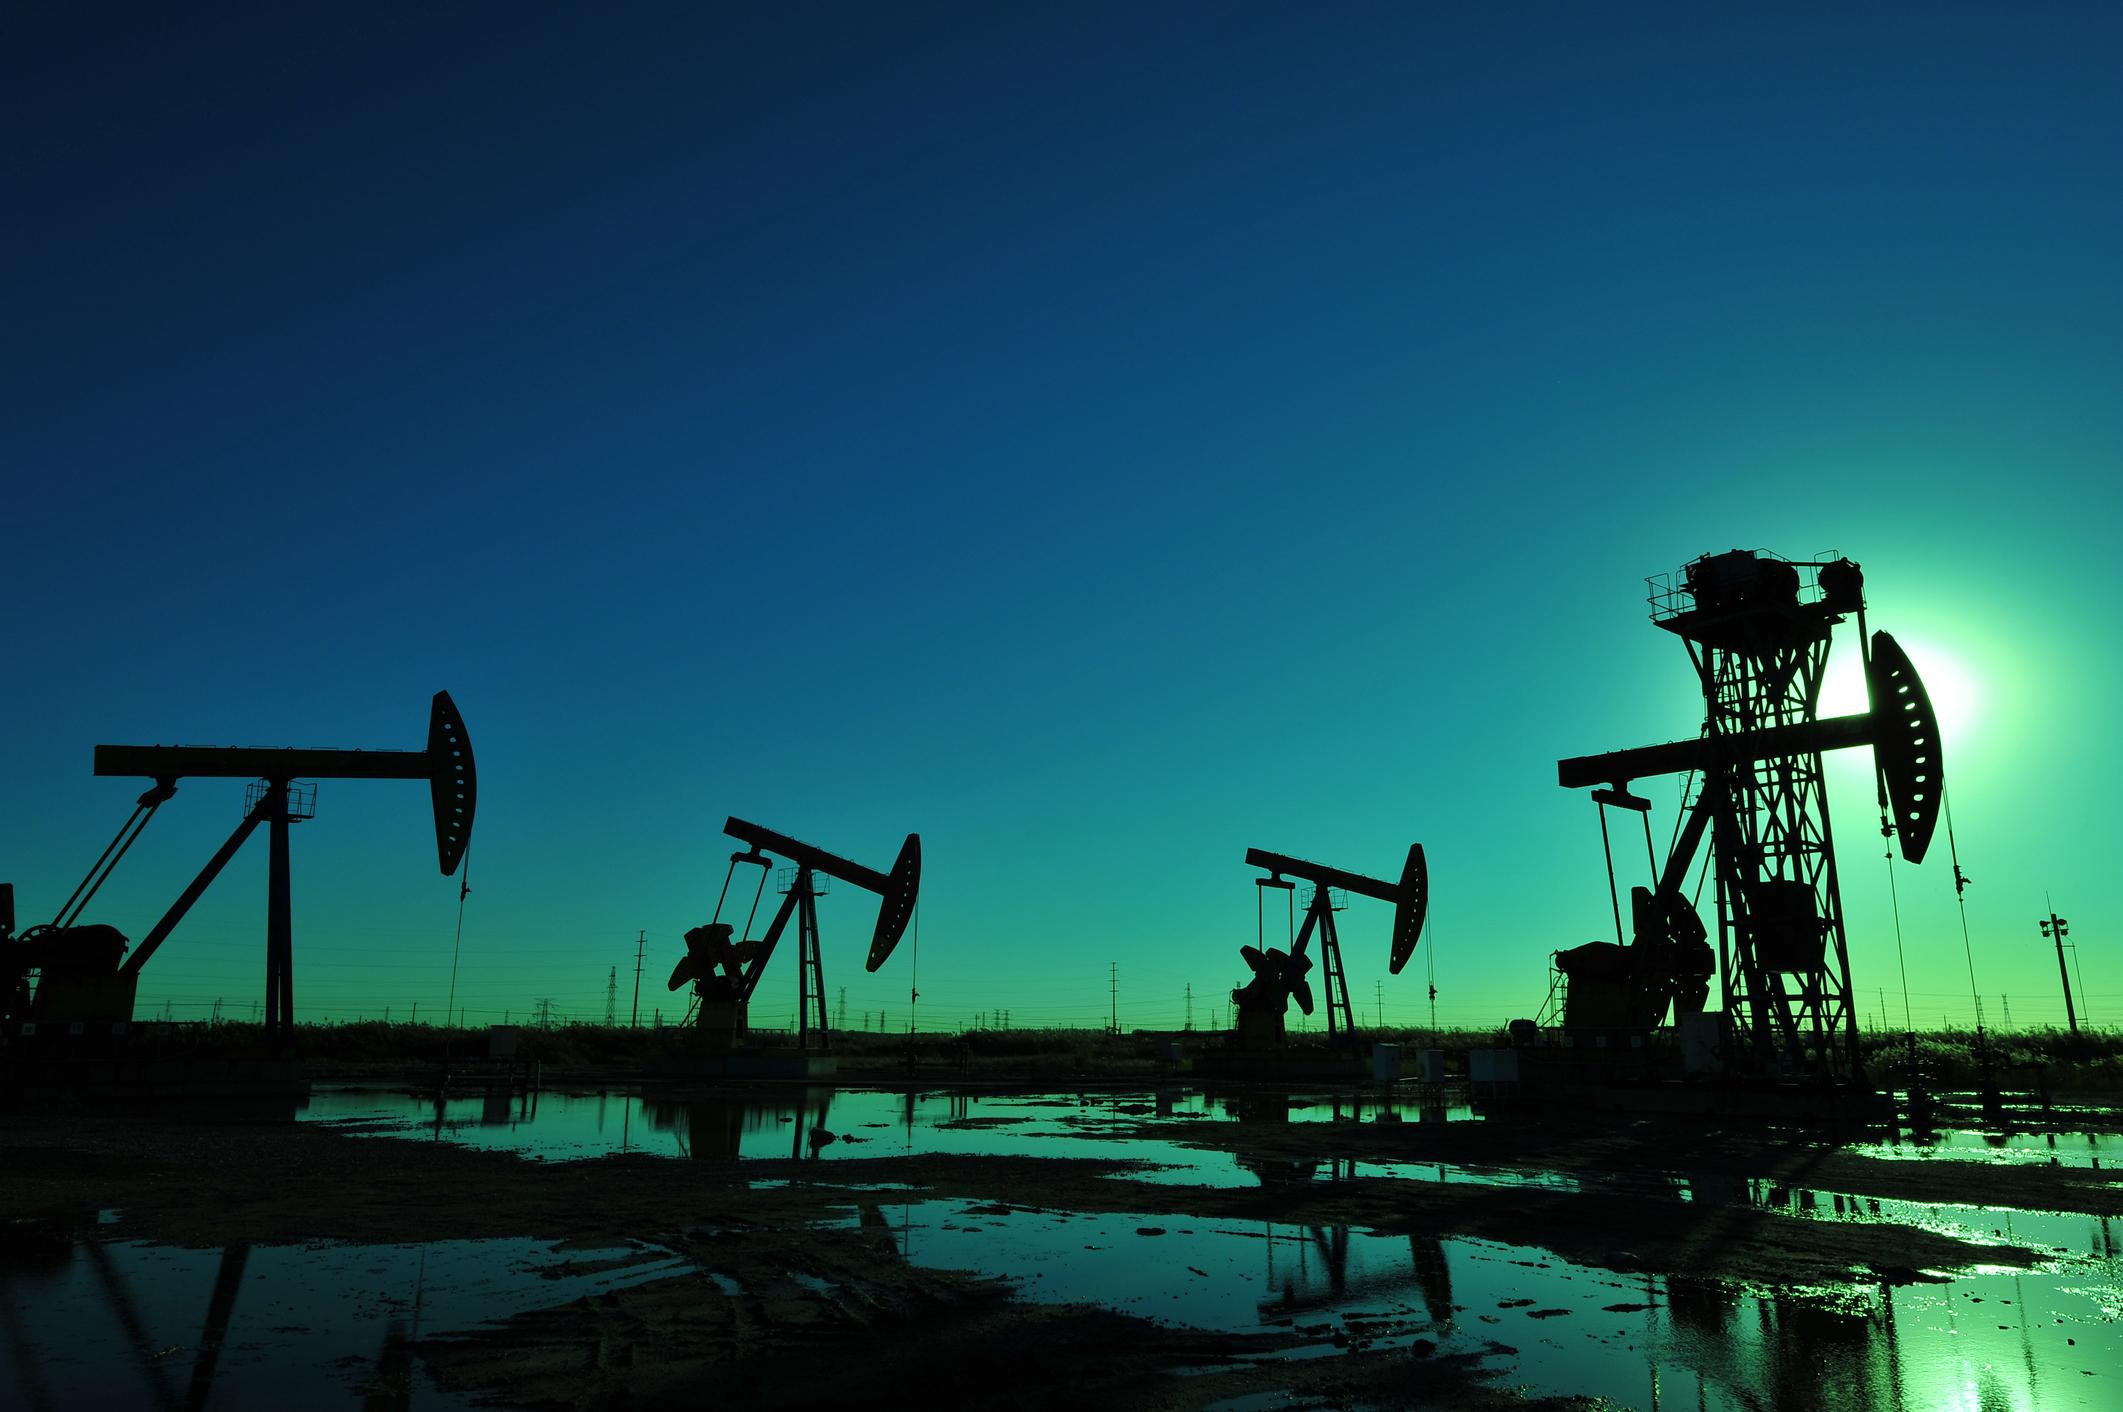 Oil pumps in silhouette against a dark sky.